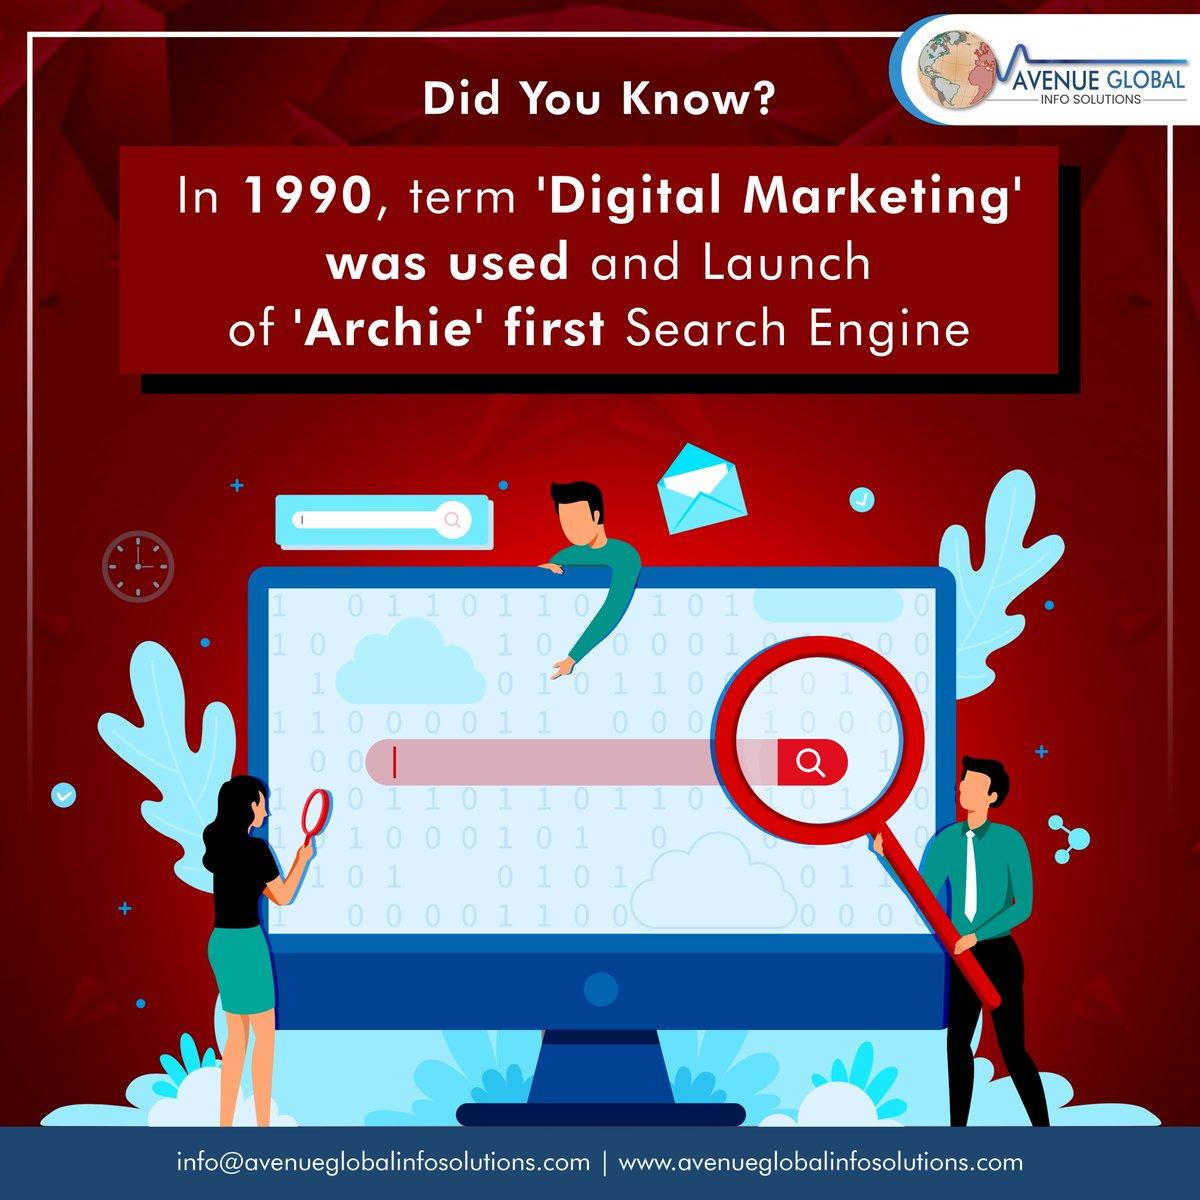 Did you know?  #didyouknow #didyouknowfacts #facts #software #Web #technologyrocks #webbrowser #technologysolutions #technologythesedays #techno #technology #techhouse #technomusic #technique #techie #androidnesia #softwaredeveloper #webdeveloper #DigitalMarketingpic.twitter.com/wEGu1LbxYl